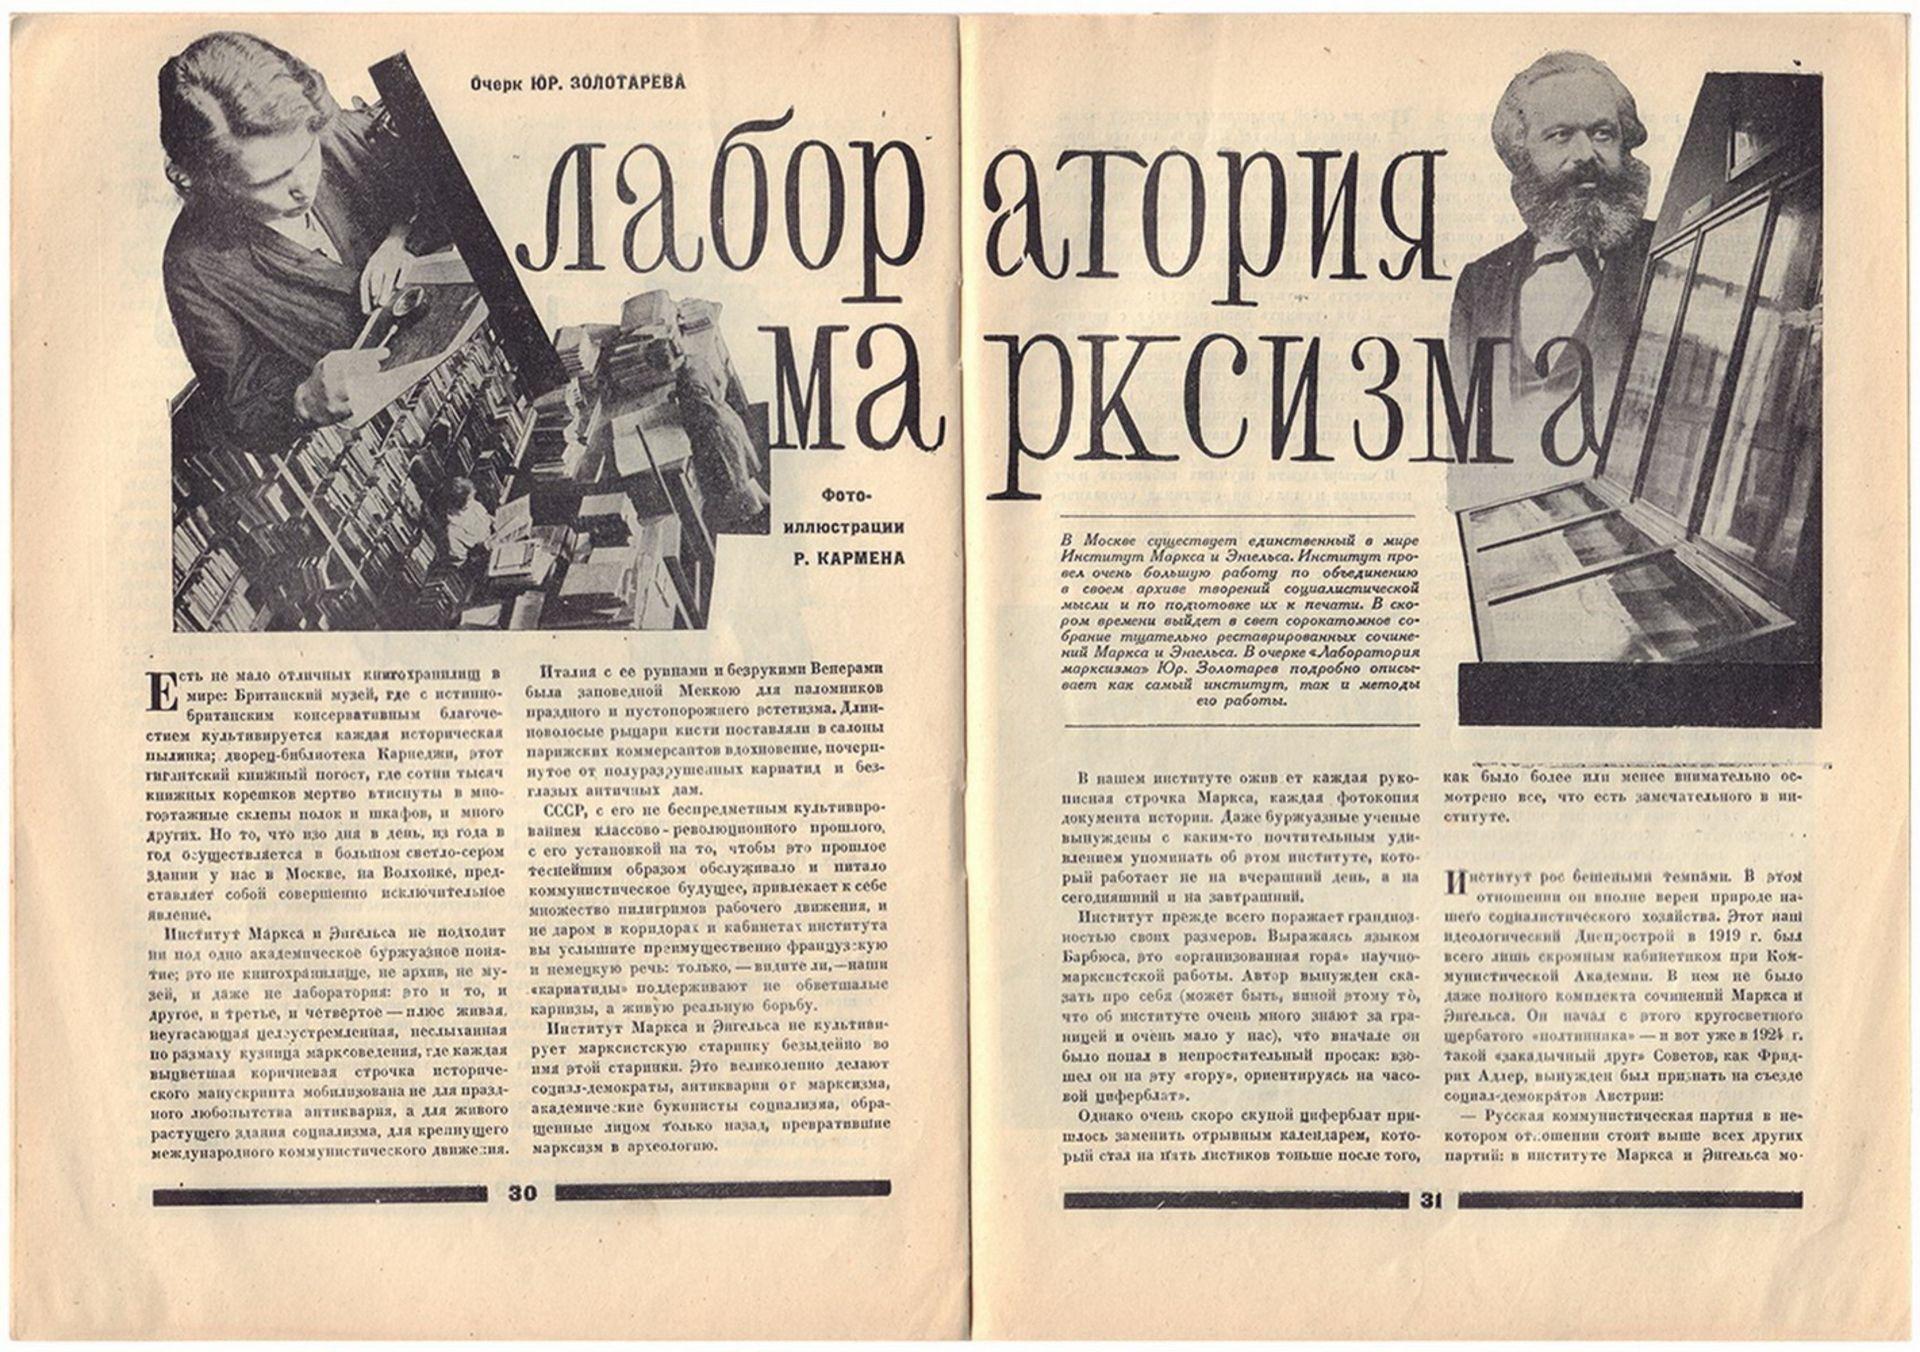 [Pimenov, Yuri. Design. Soviet art]. 30 days: Magazine. Issue 8th. - Moscow, 1930. - [1], 93, [4] pp - Bild 2 aus 3